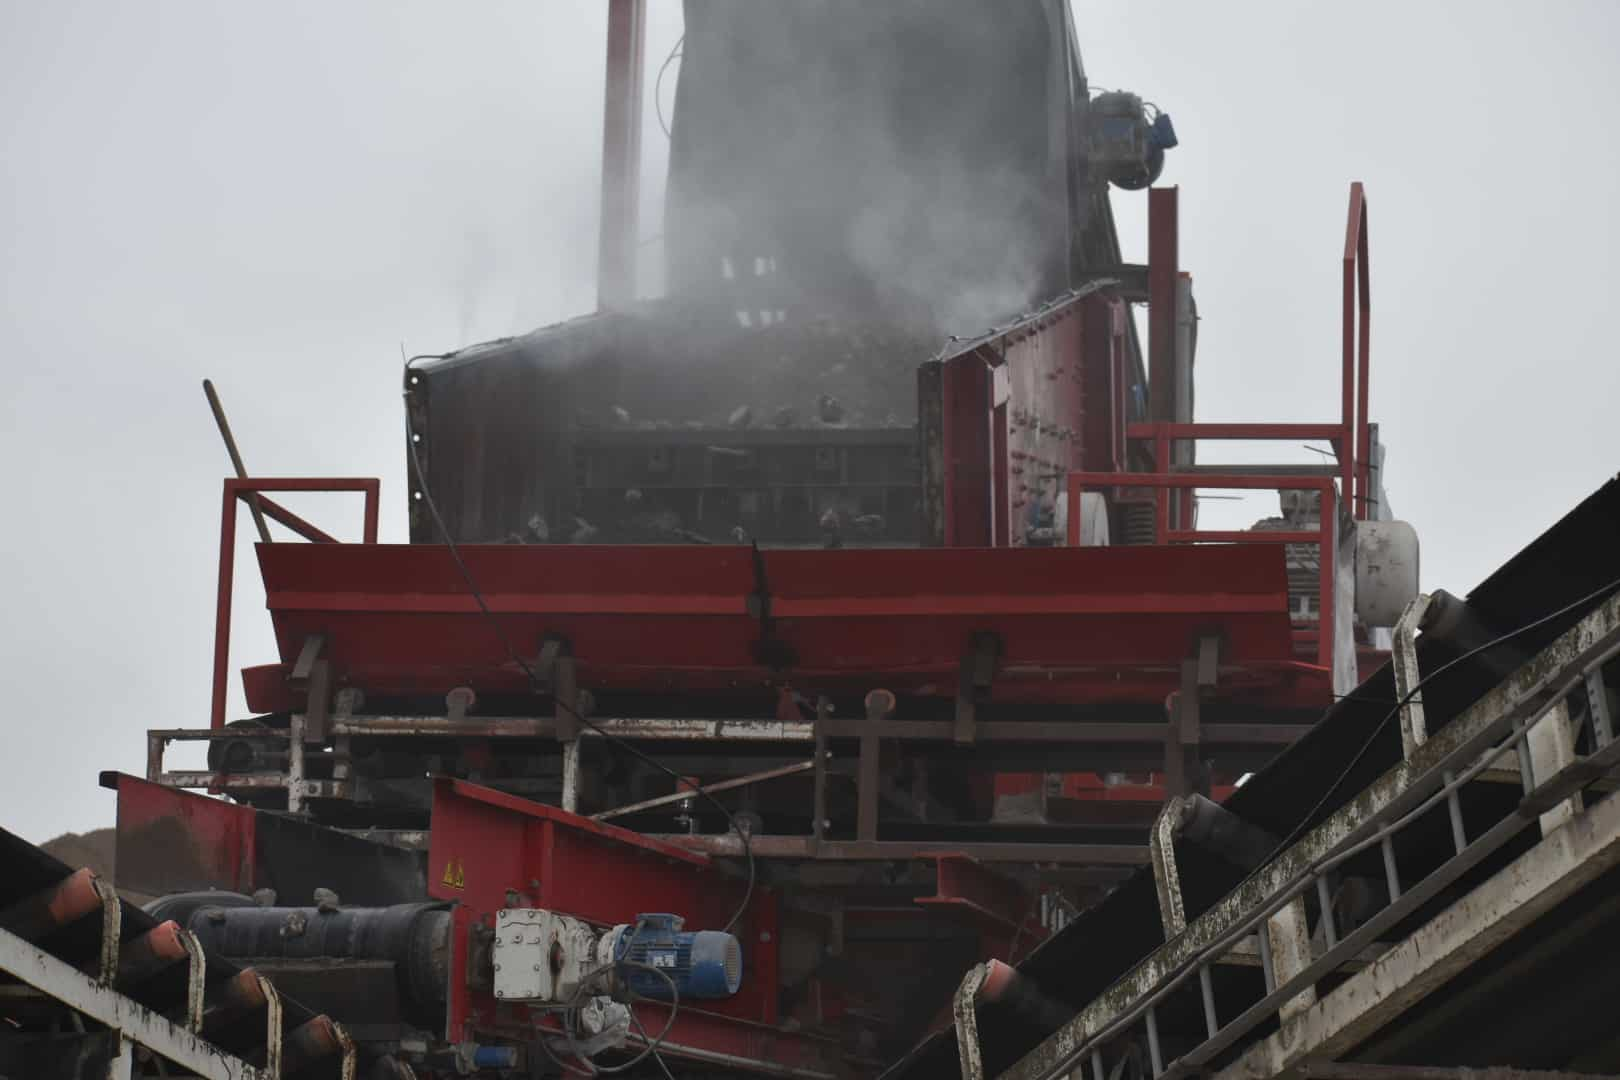 Nebula Dust stofbehandeling